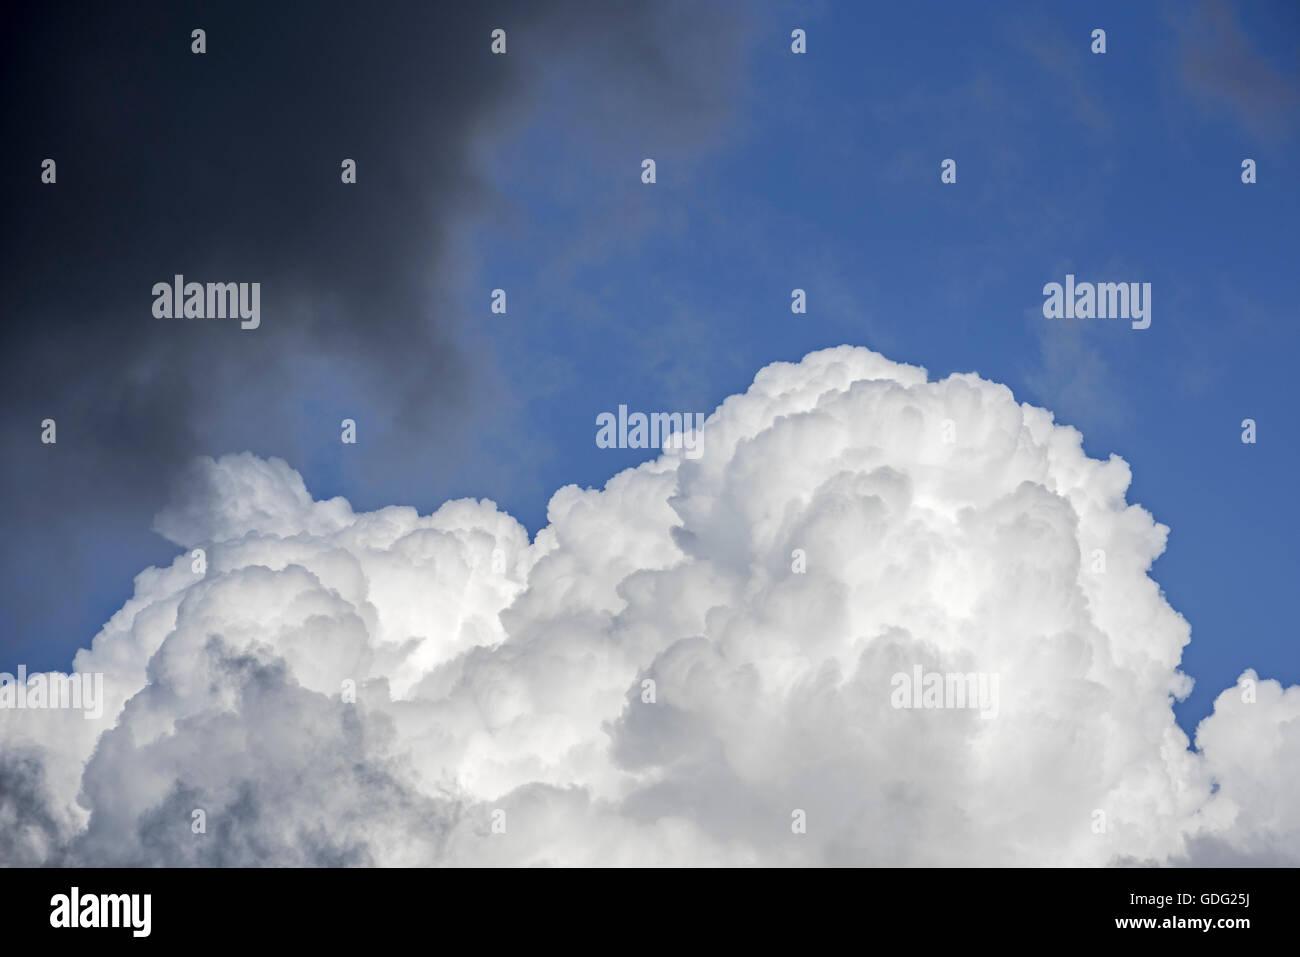 Cumulus congestus / towering cumulus cloud and black rain cloud covering the blue sky Stock Photo